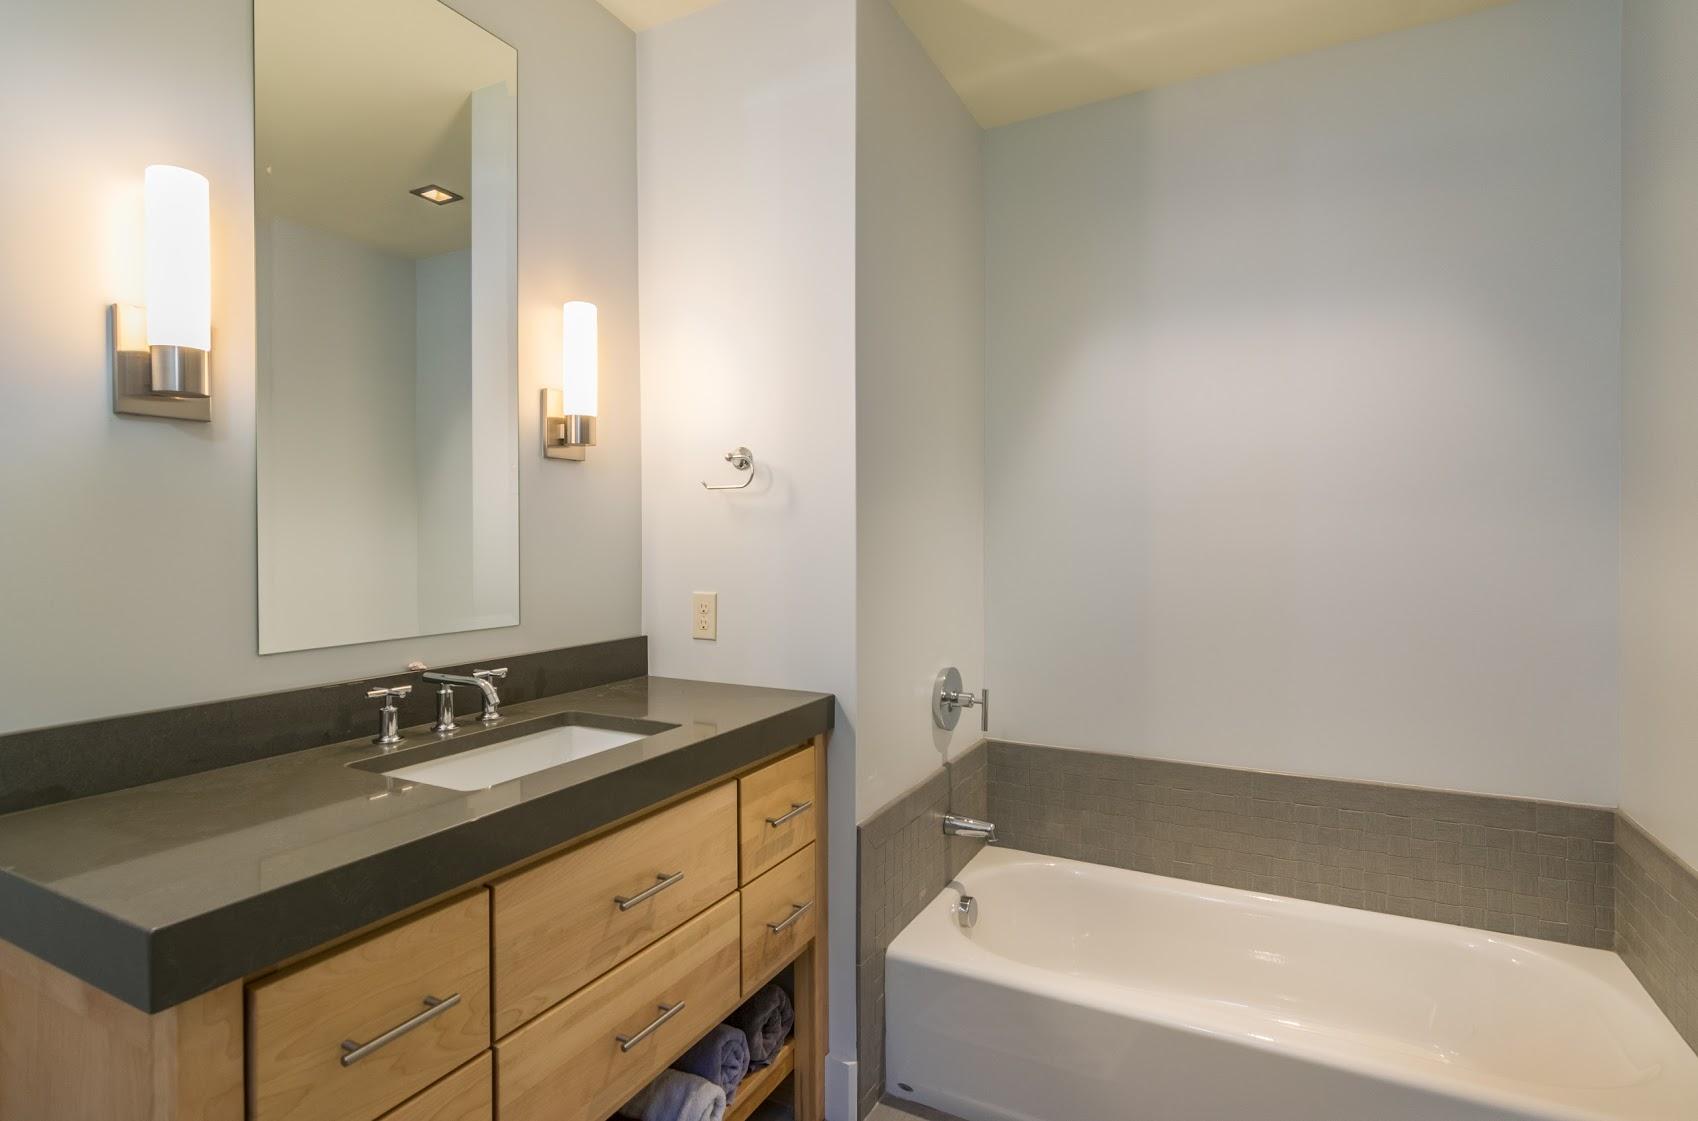 https://www.blackrockus.com/wp-content/uploads/2017/12/Bathroom.jpg